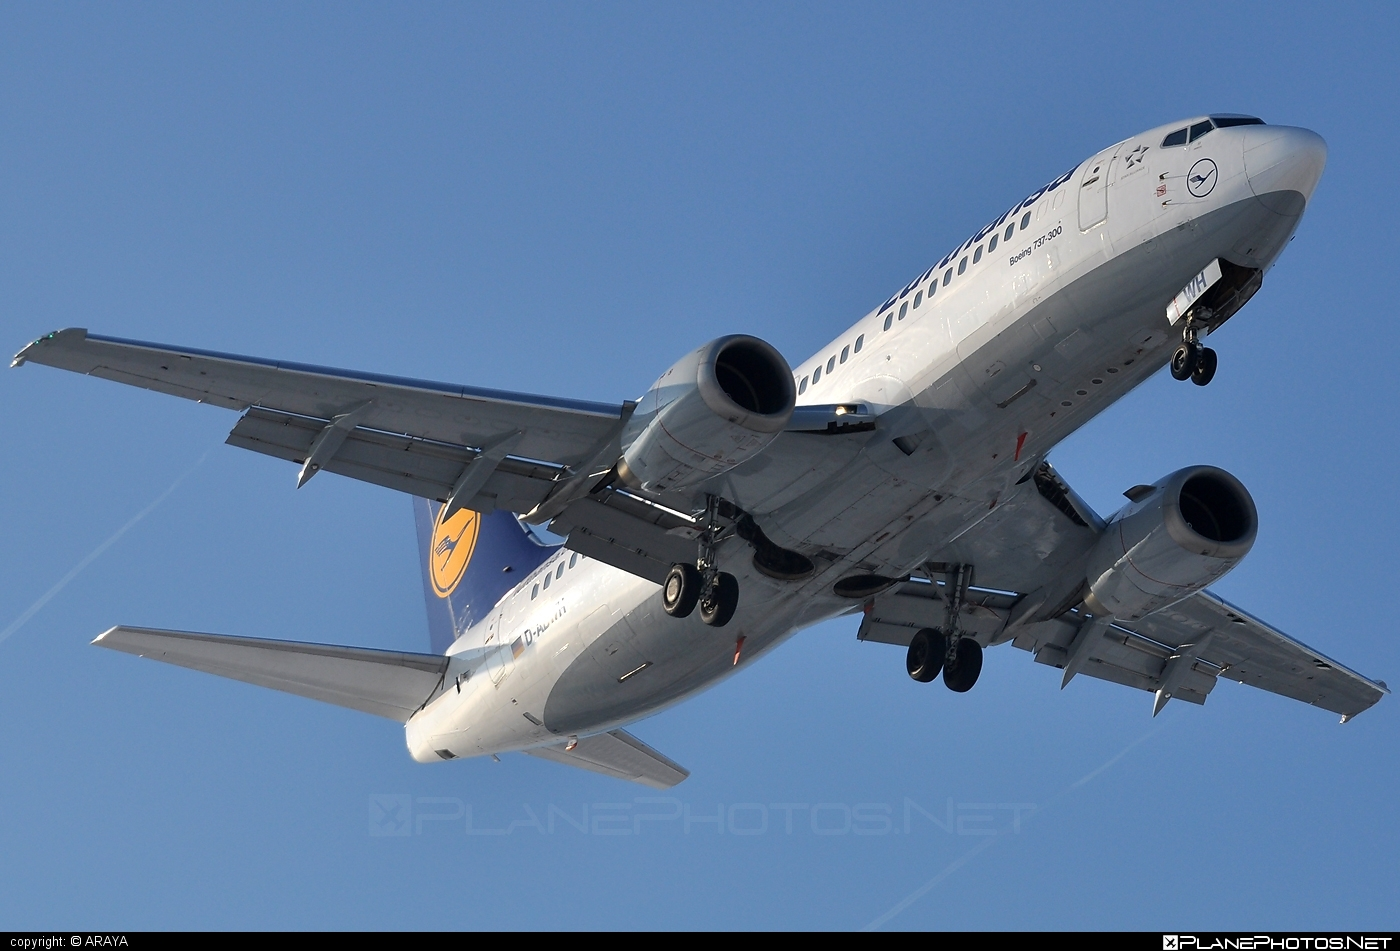 Boeing 737-300 - D-ABWH operated by Lufthansa #b737 #boeing #boeing737 #lufthansa